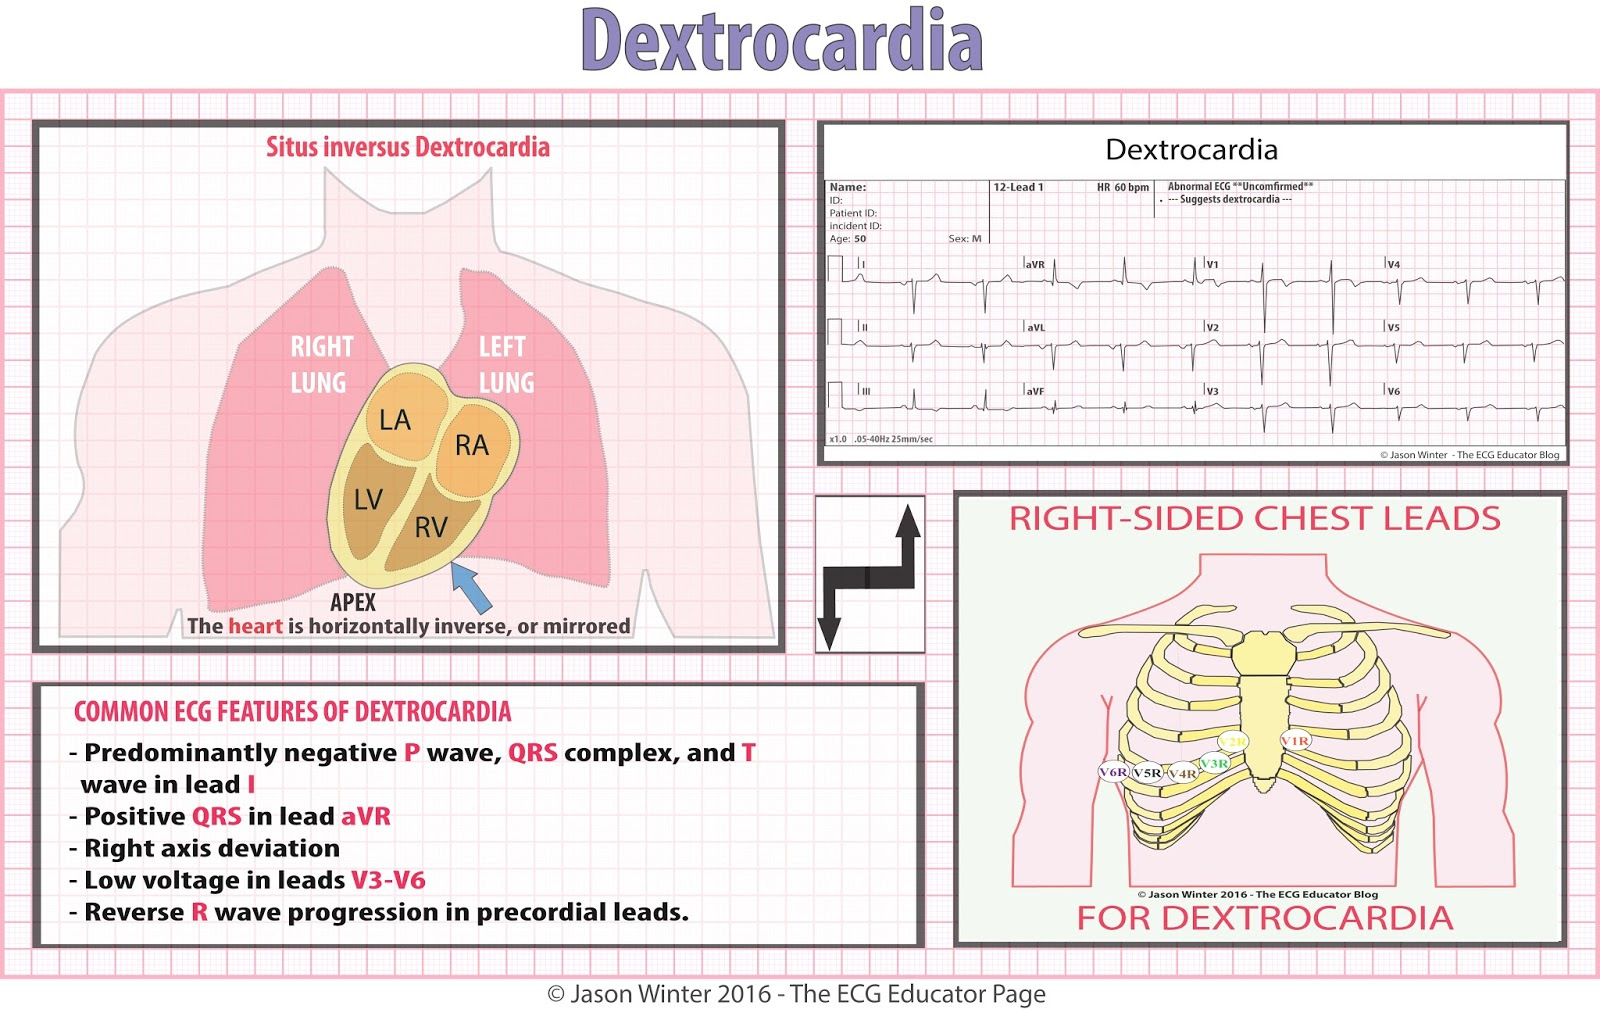 12 lead ekg placement diagram laser printer ecg educator blog dextrocardia